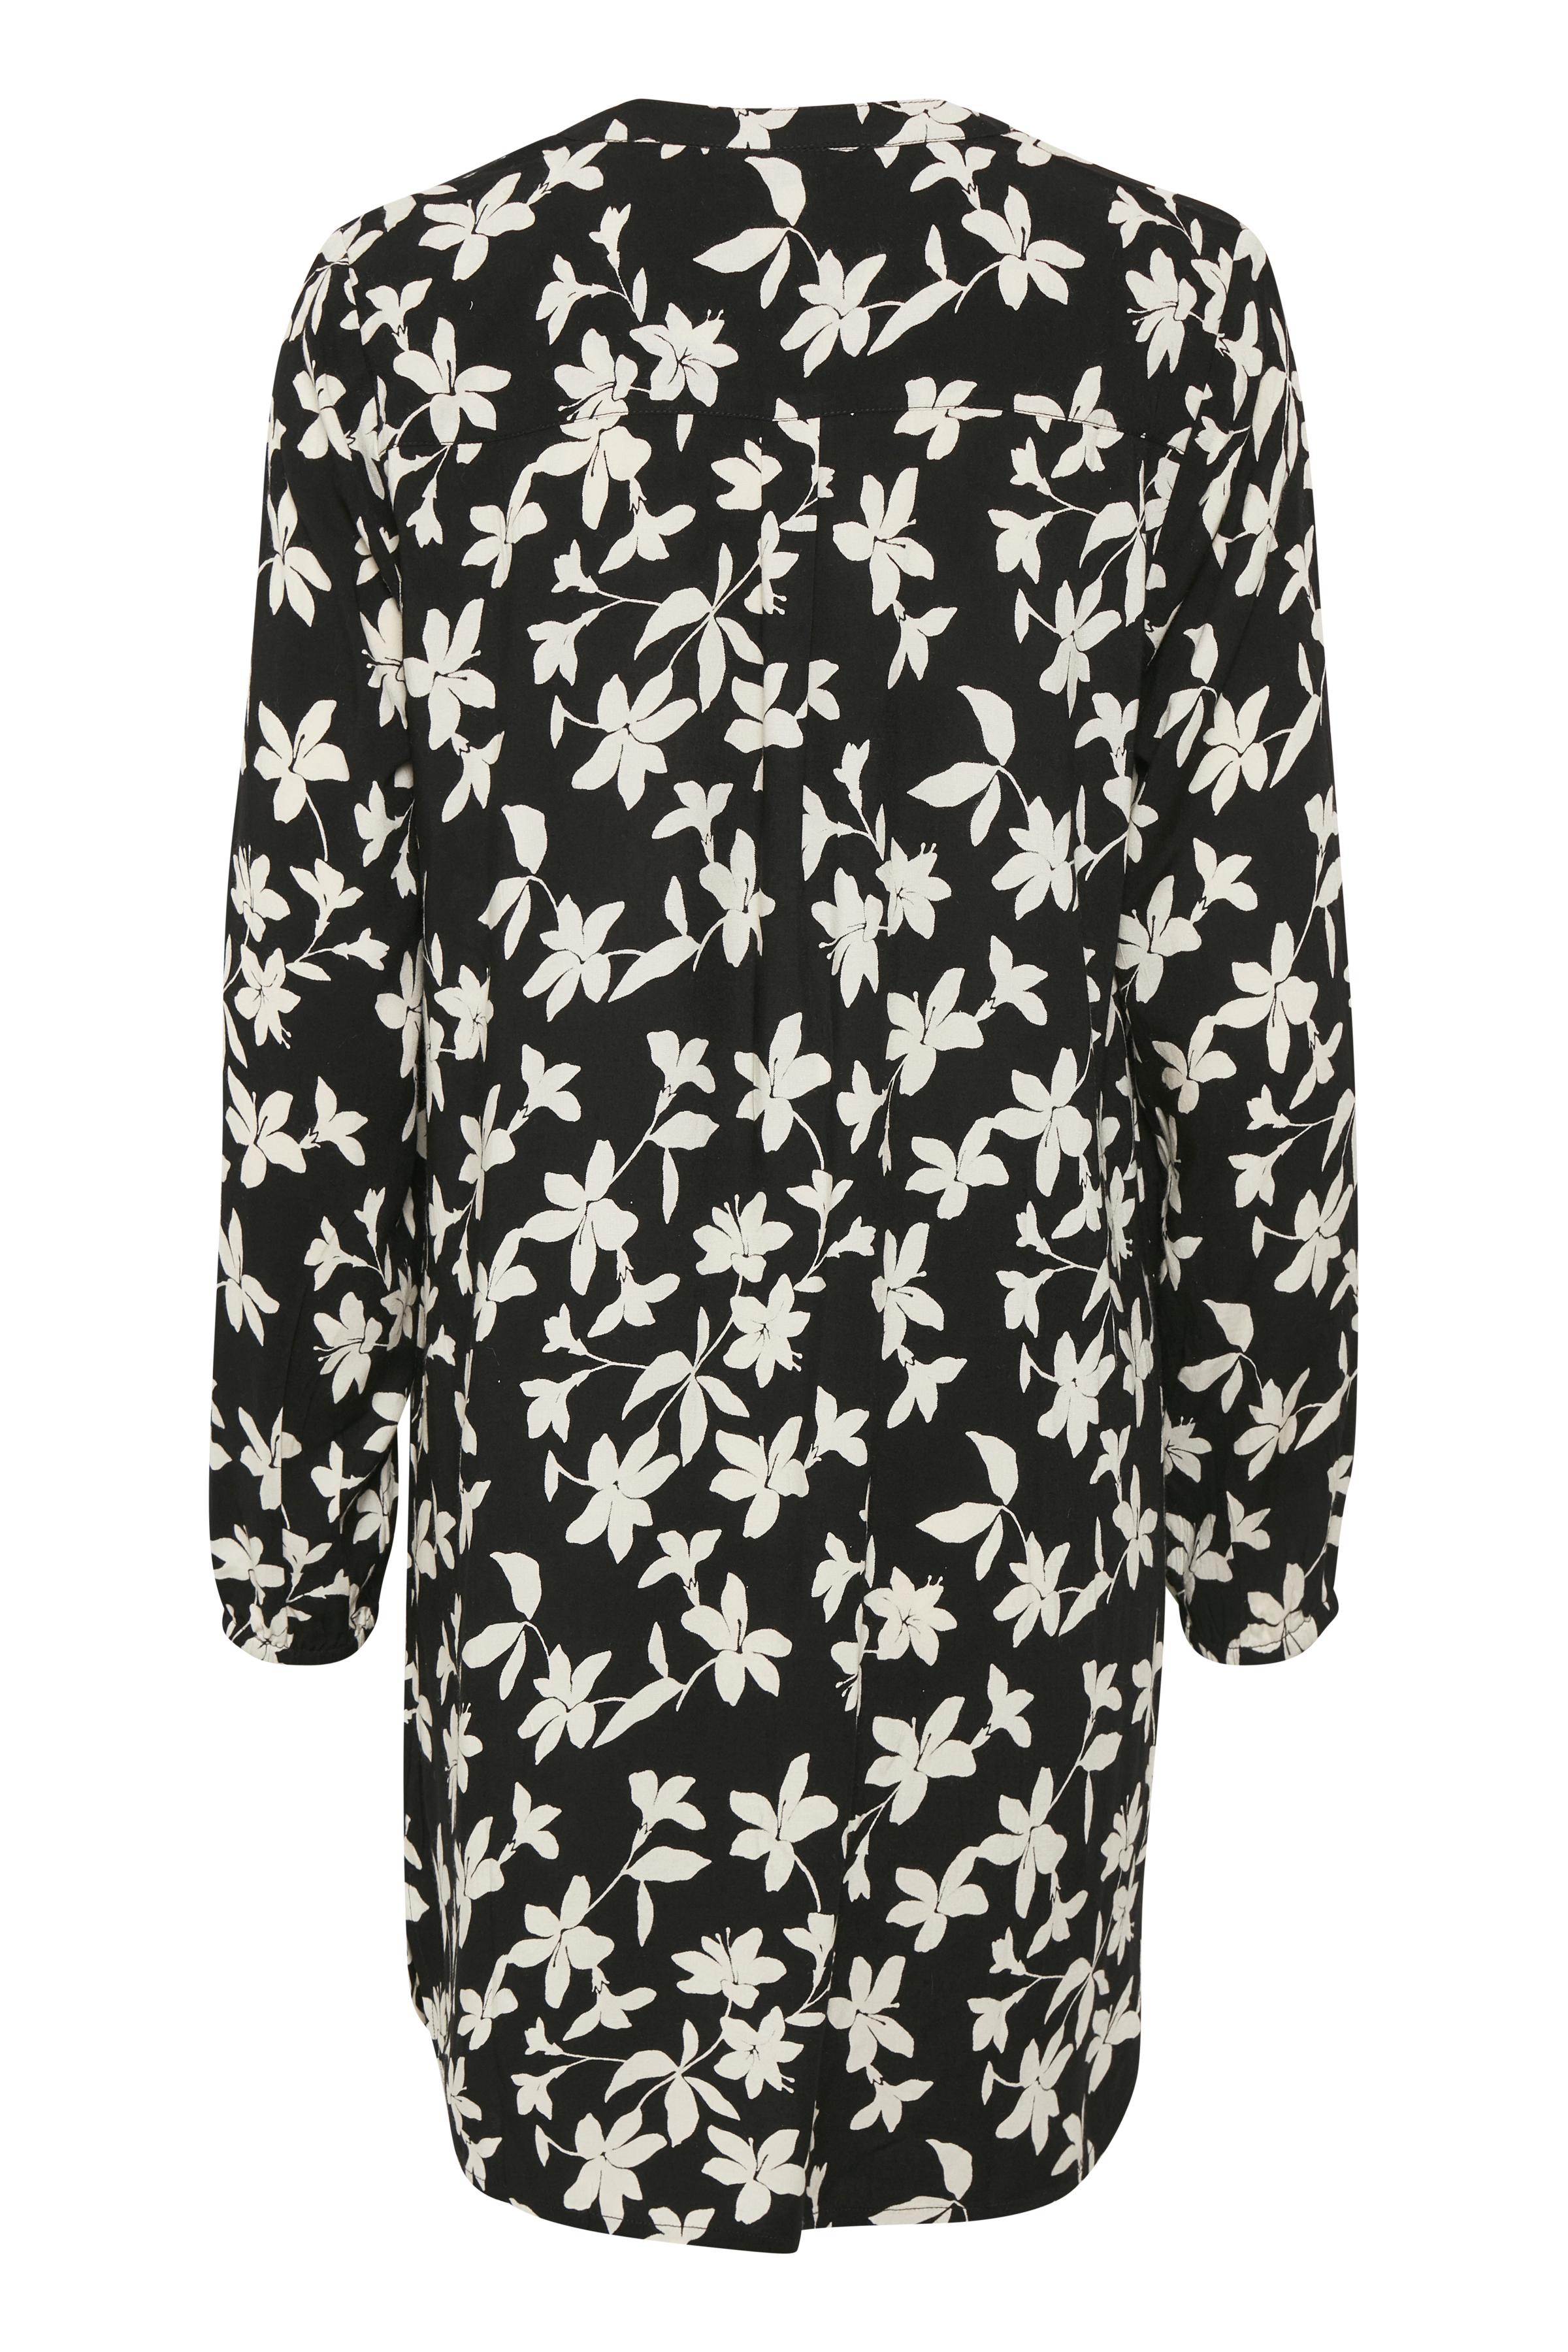 Off-white/svart Tunika från Bon'A Parte – Köp Off-white/svart Tunika från stl. S-2XL här